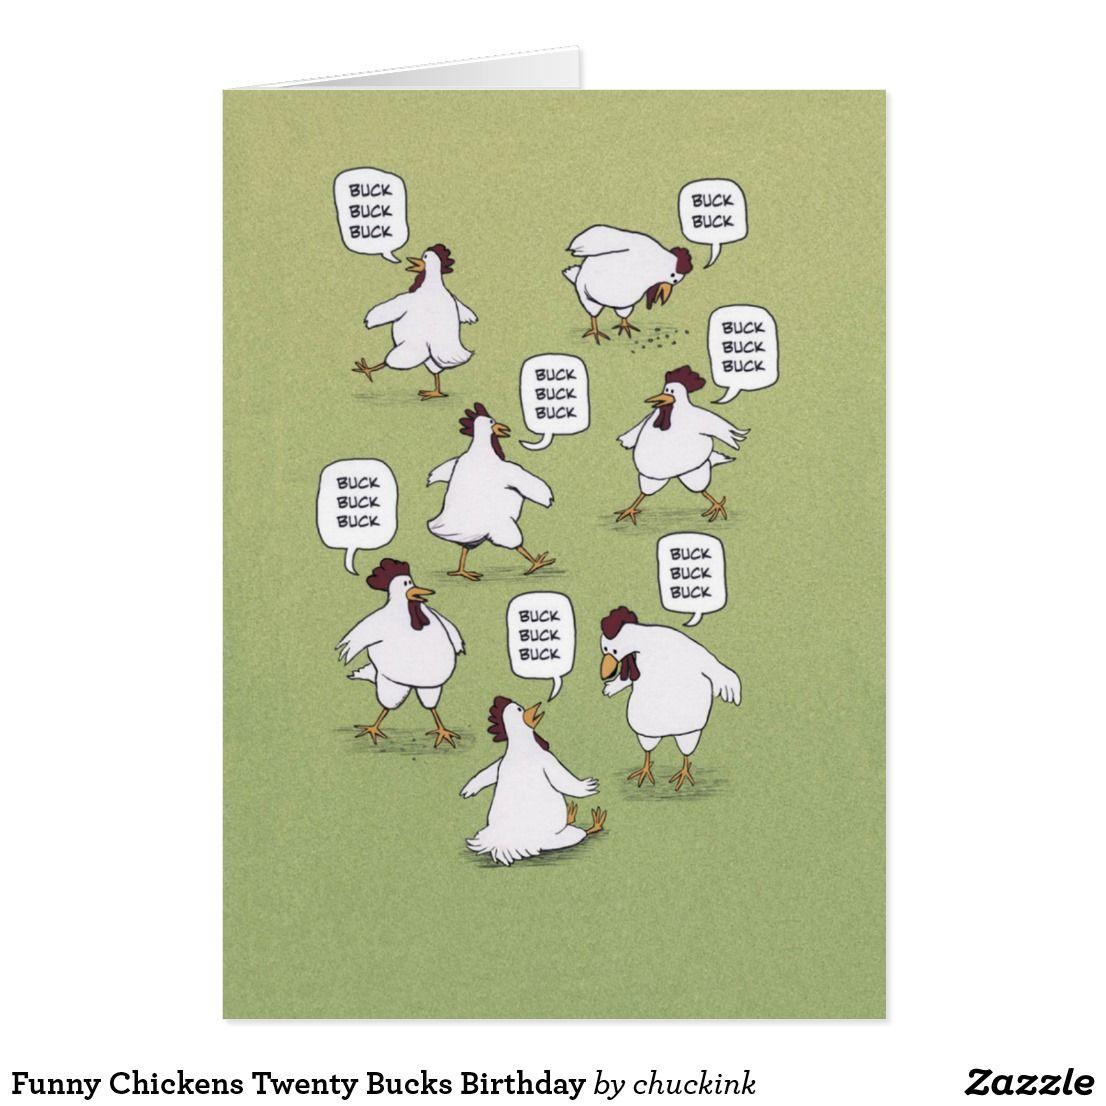 Funny chickens twenty bucks birthday card funny greeting cards funny chickens twenty bucks birthday card kristyandbryce Gallery